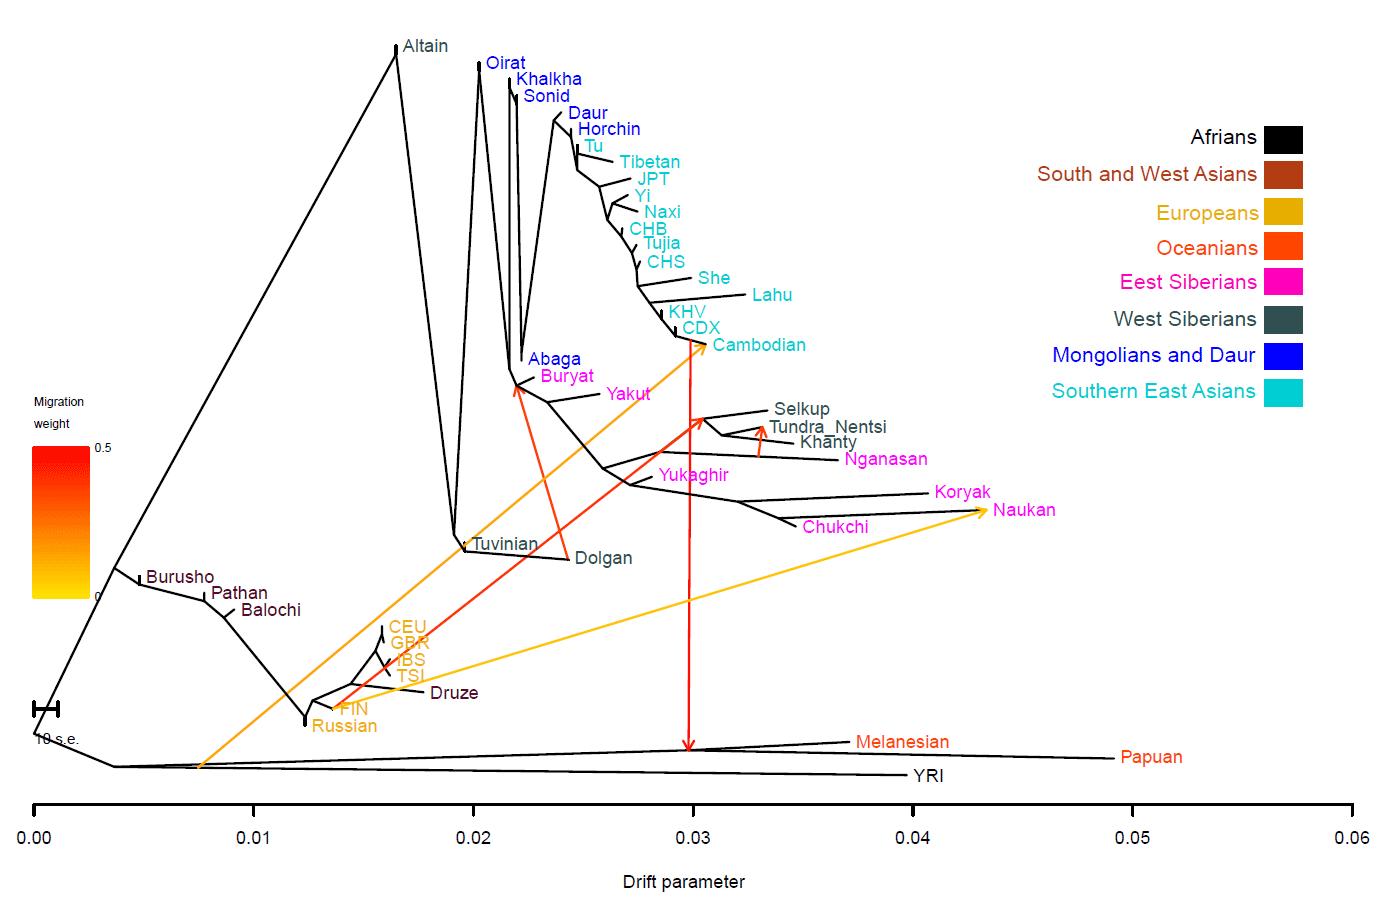 migration-finns-nganasan